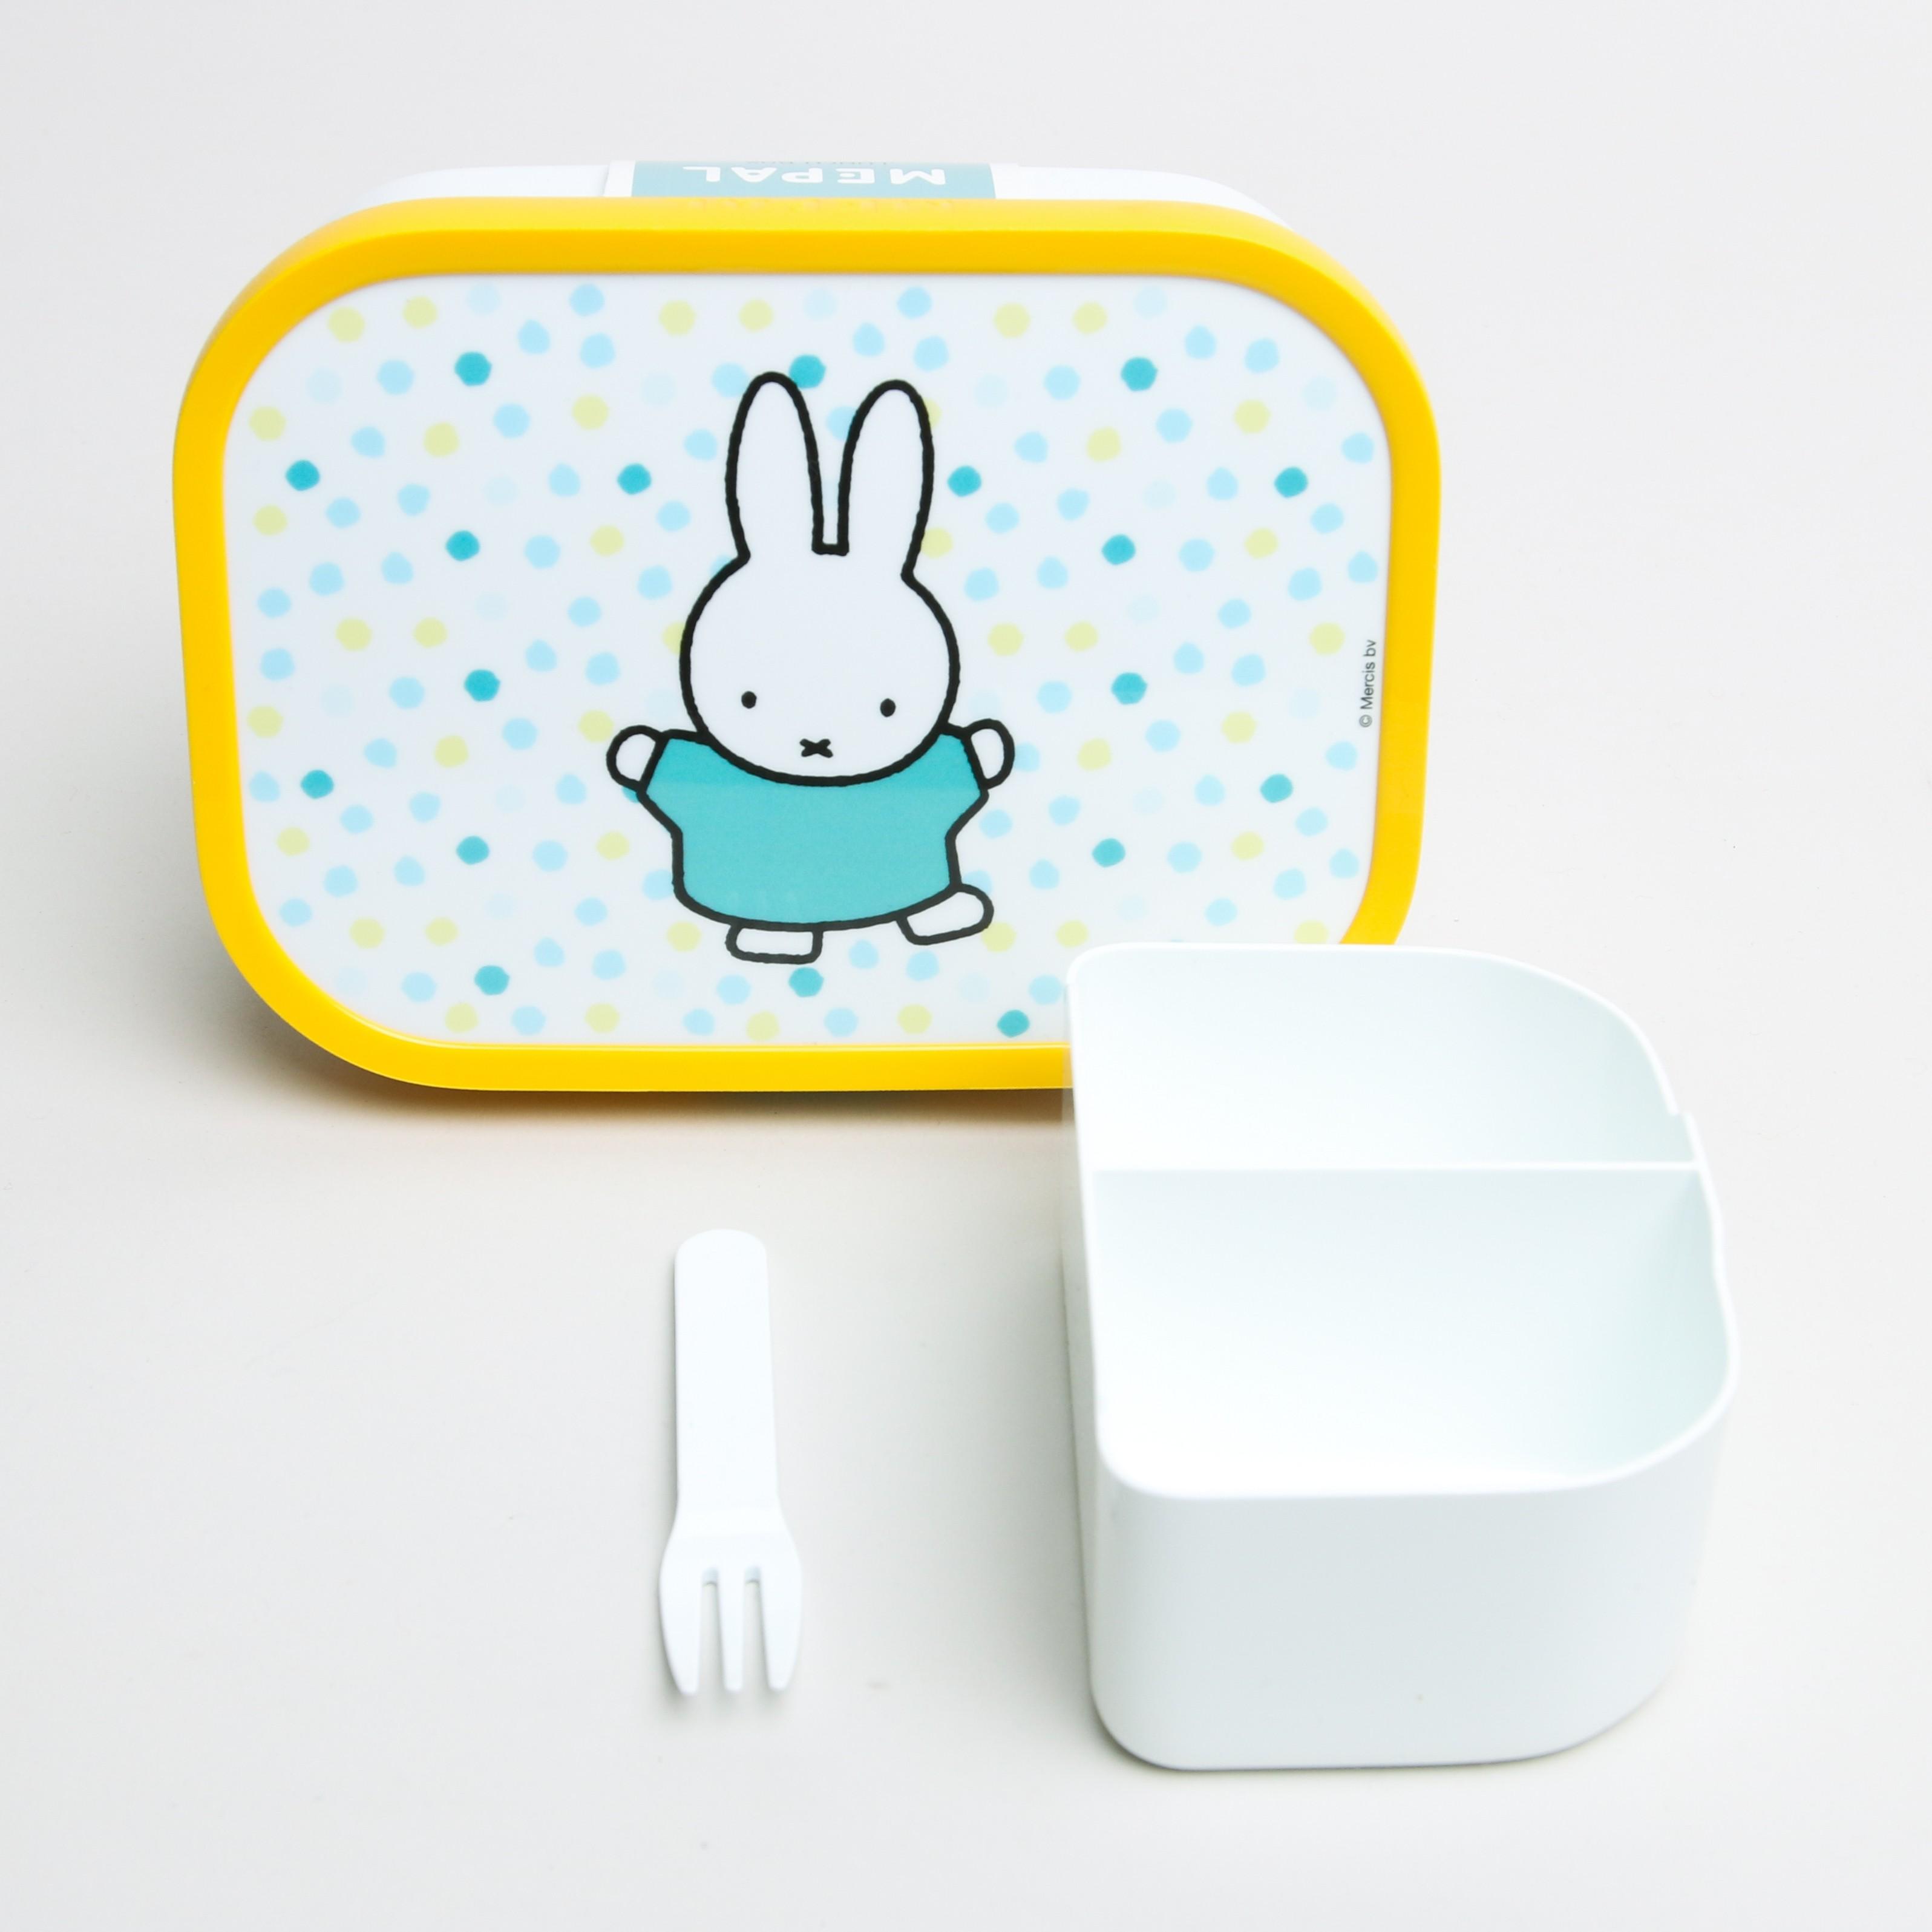 Mepal Miffy Lunchbox